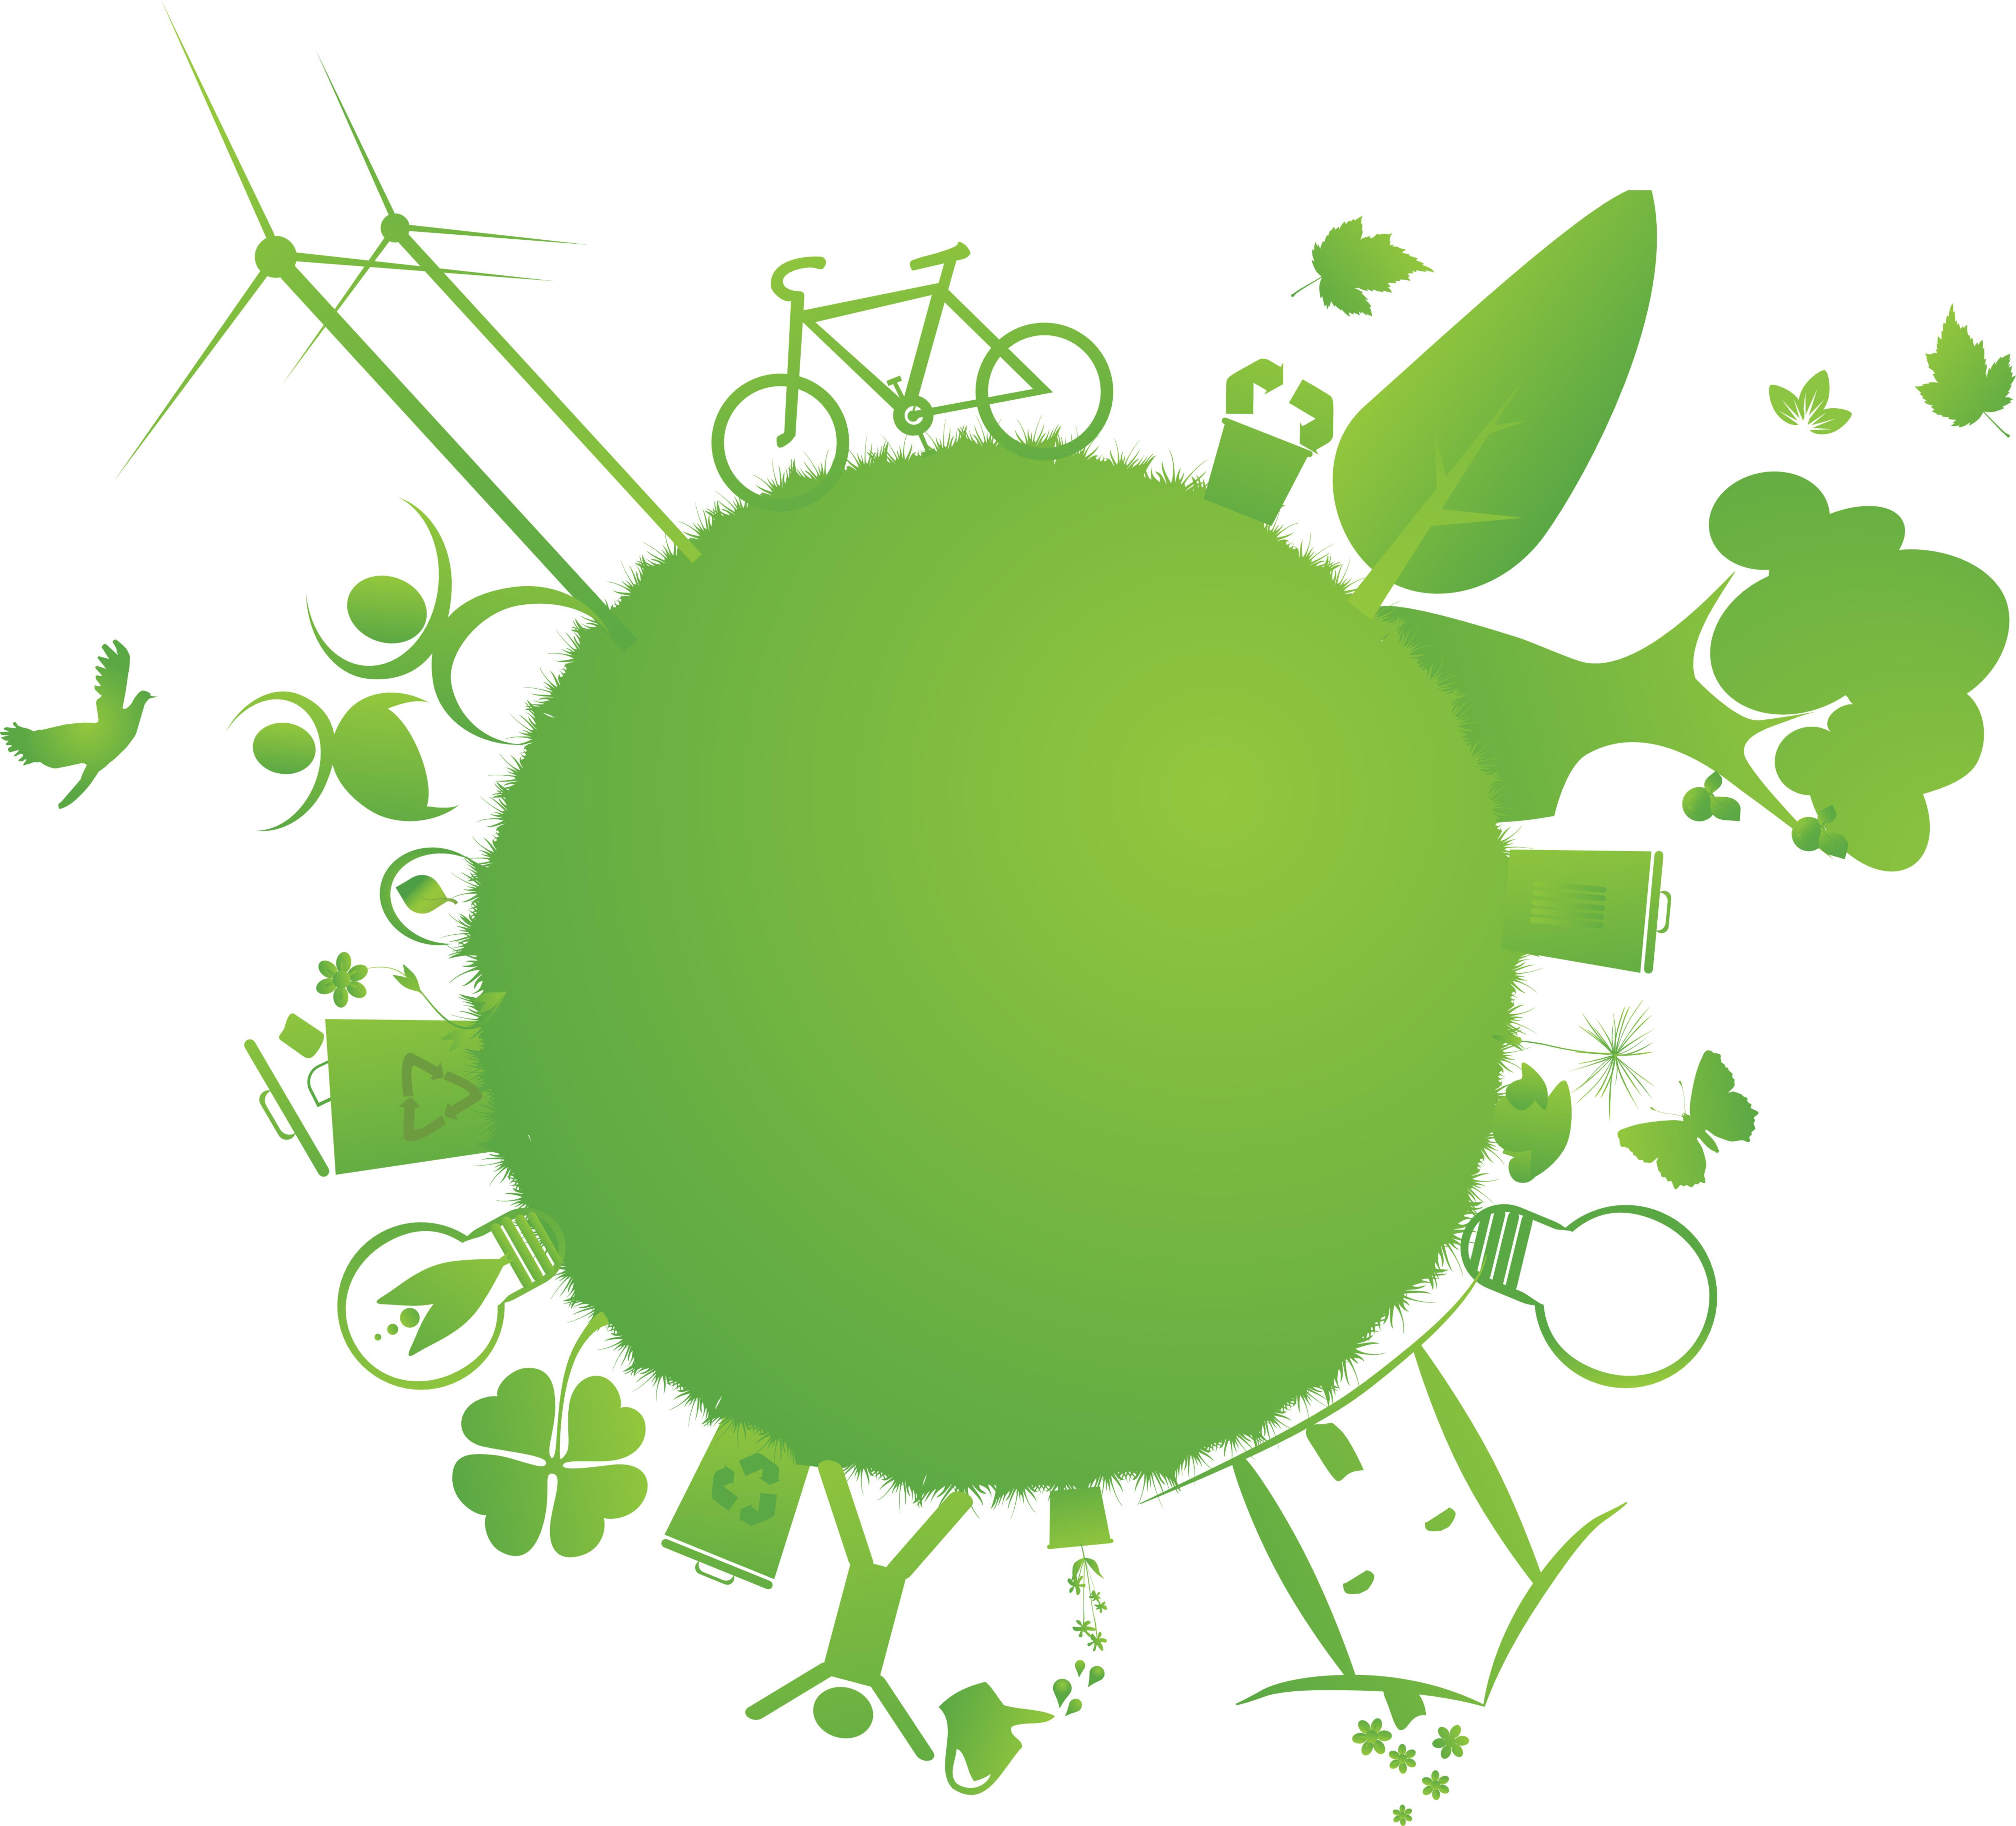 Green Earth Hands.